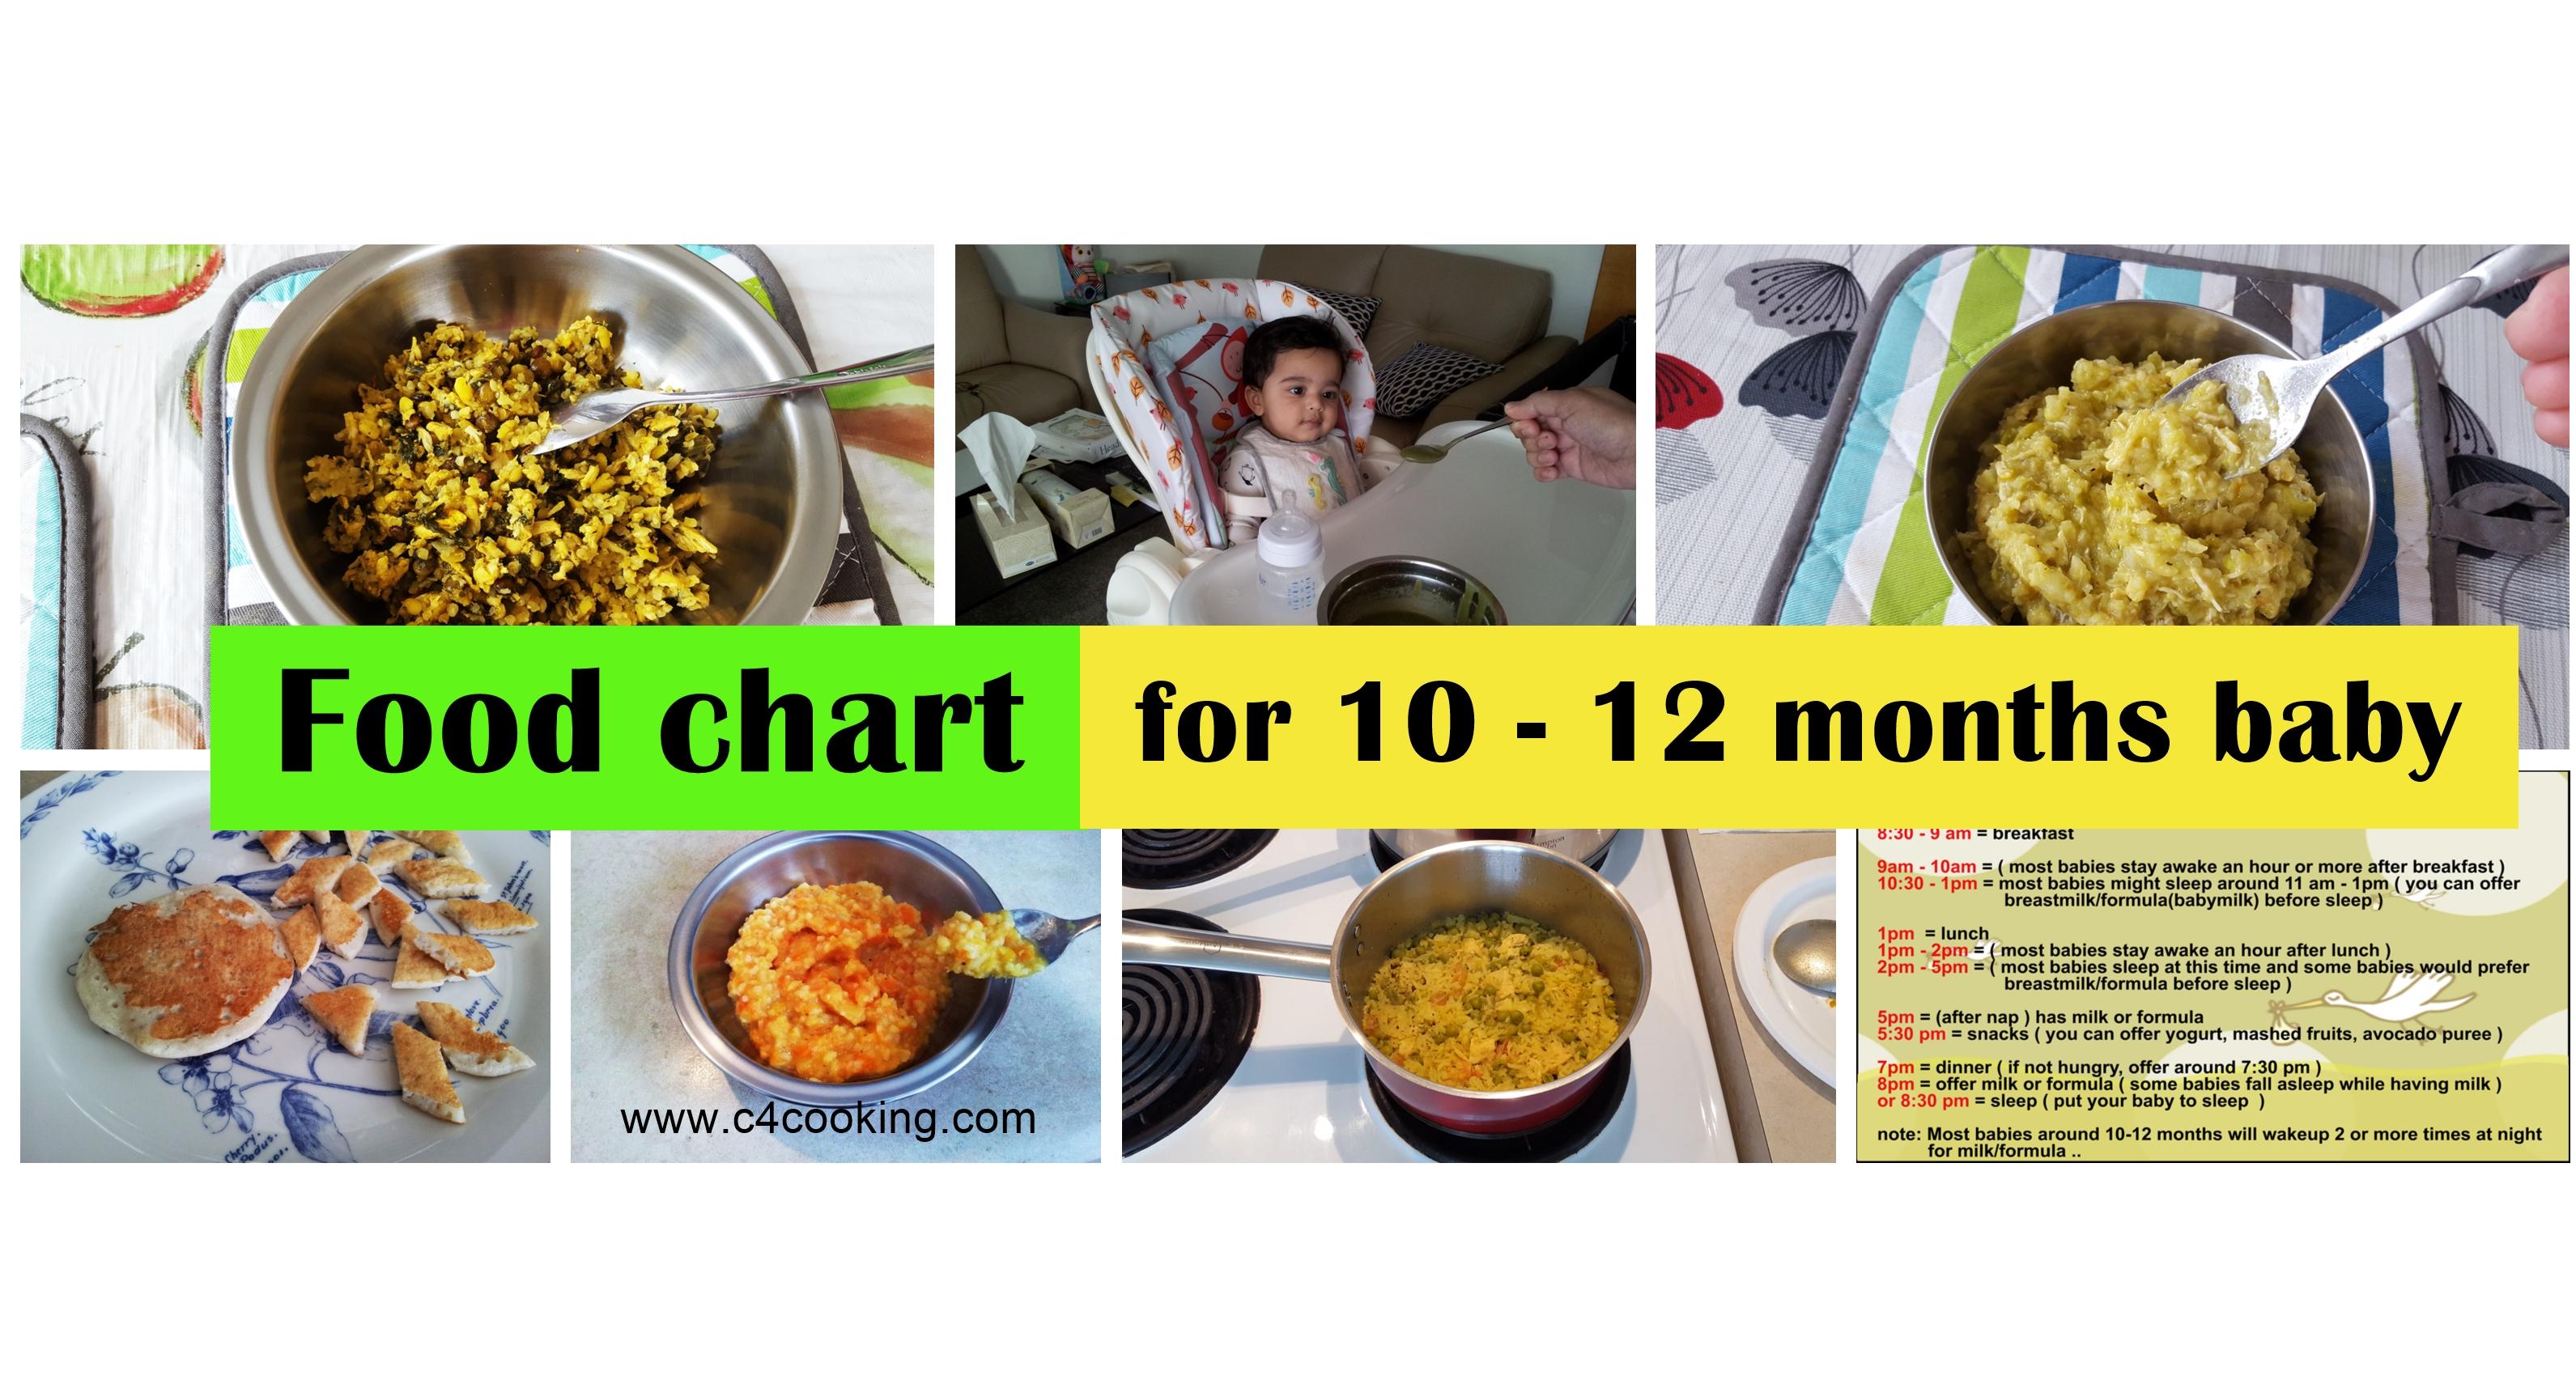 10 months baby food chart, 11 months baby food chart, 12 months baby food chart